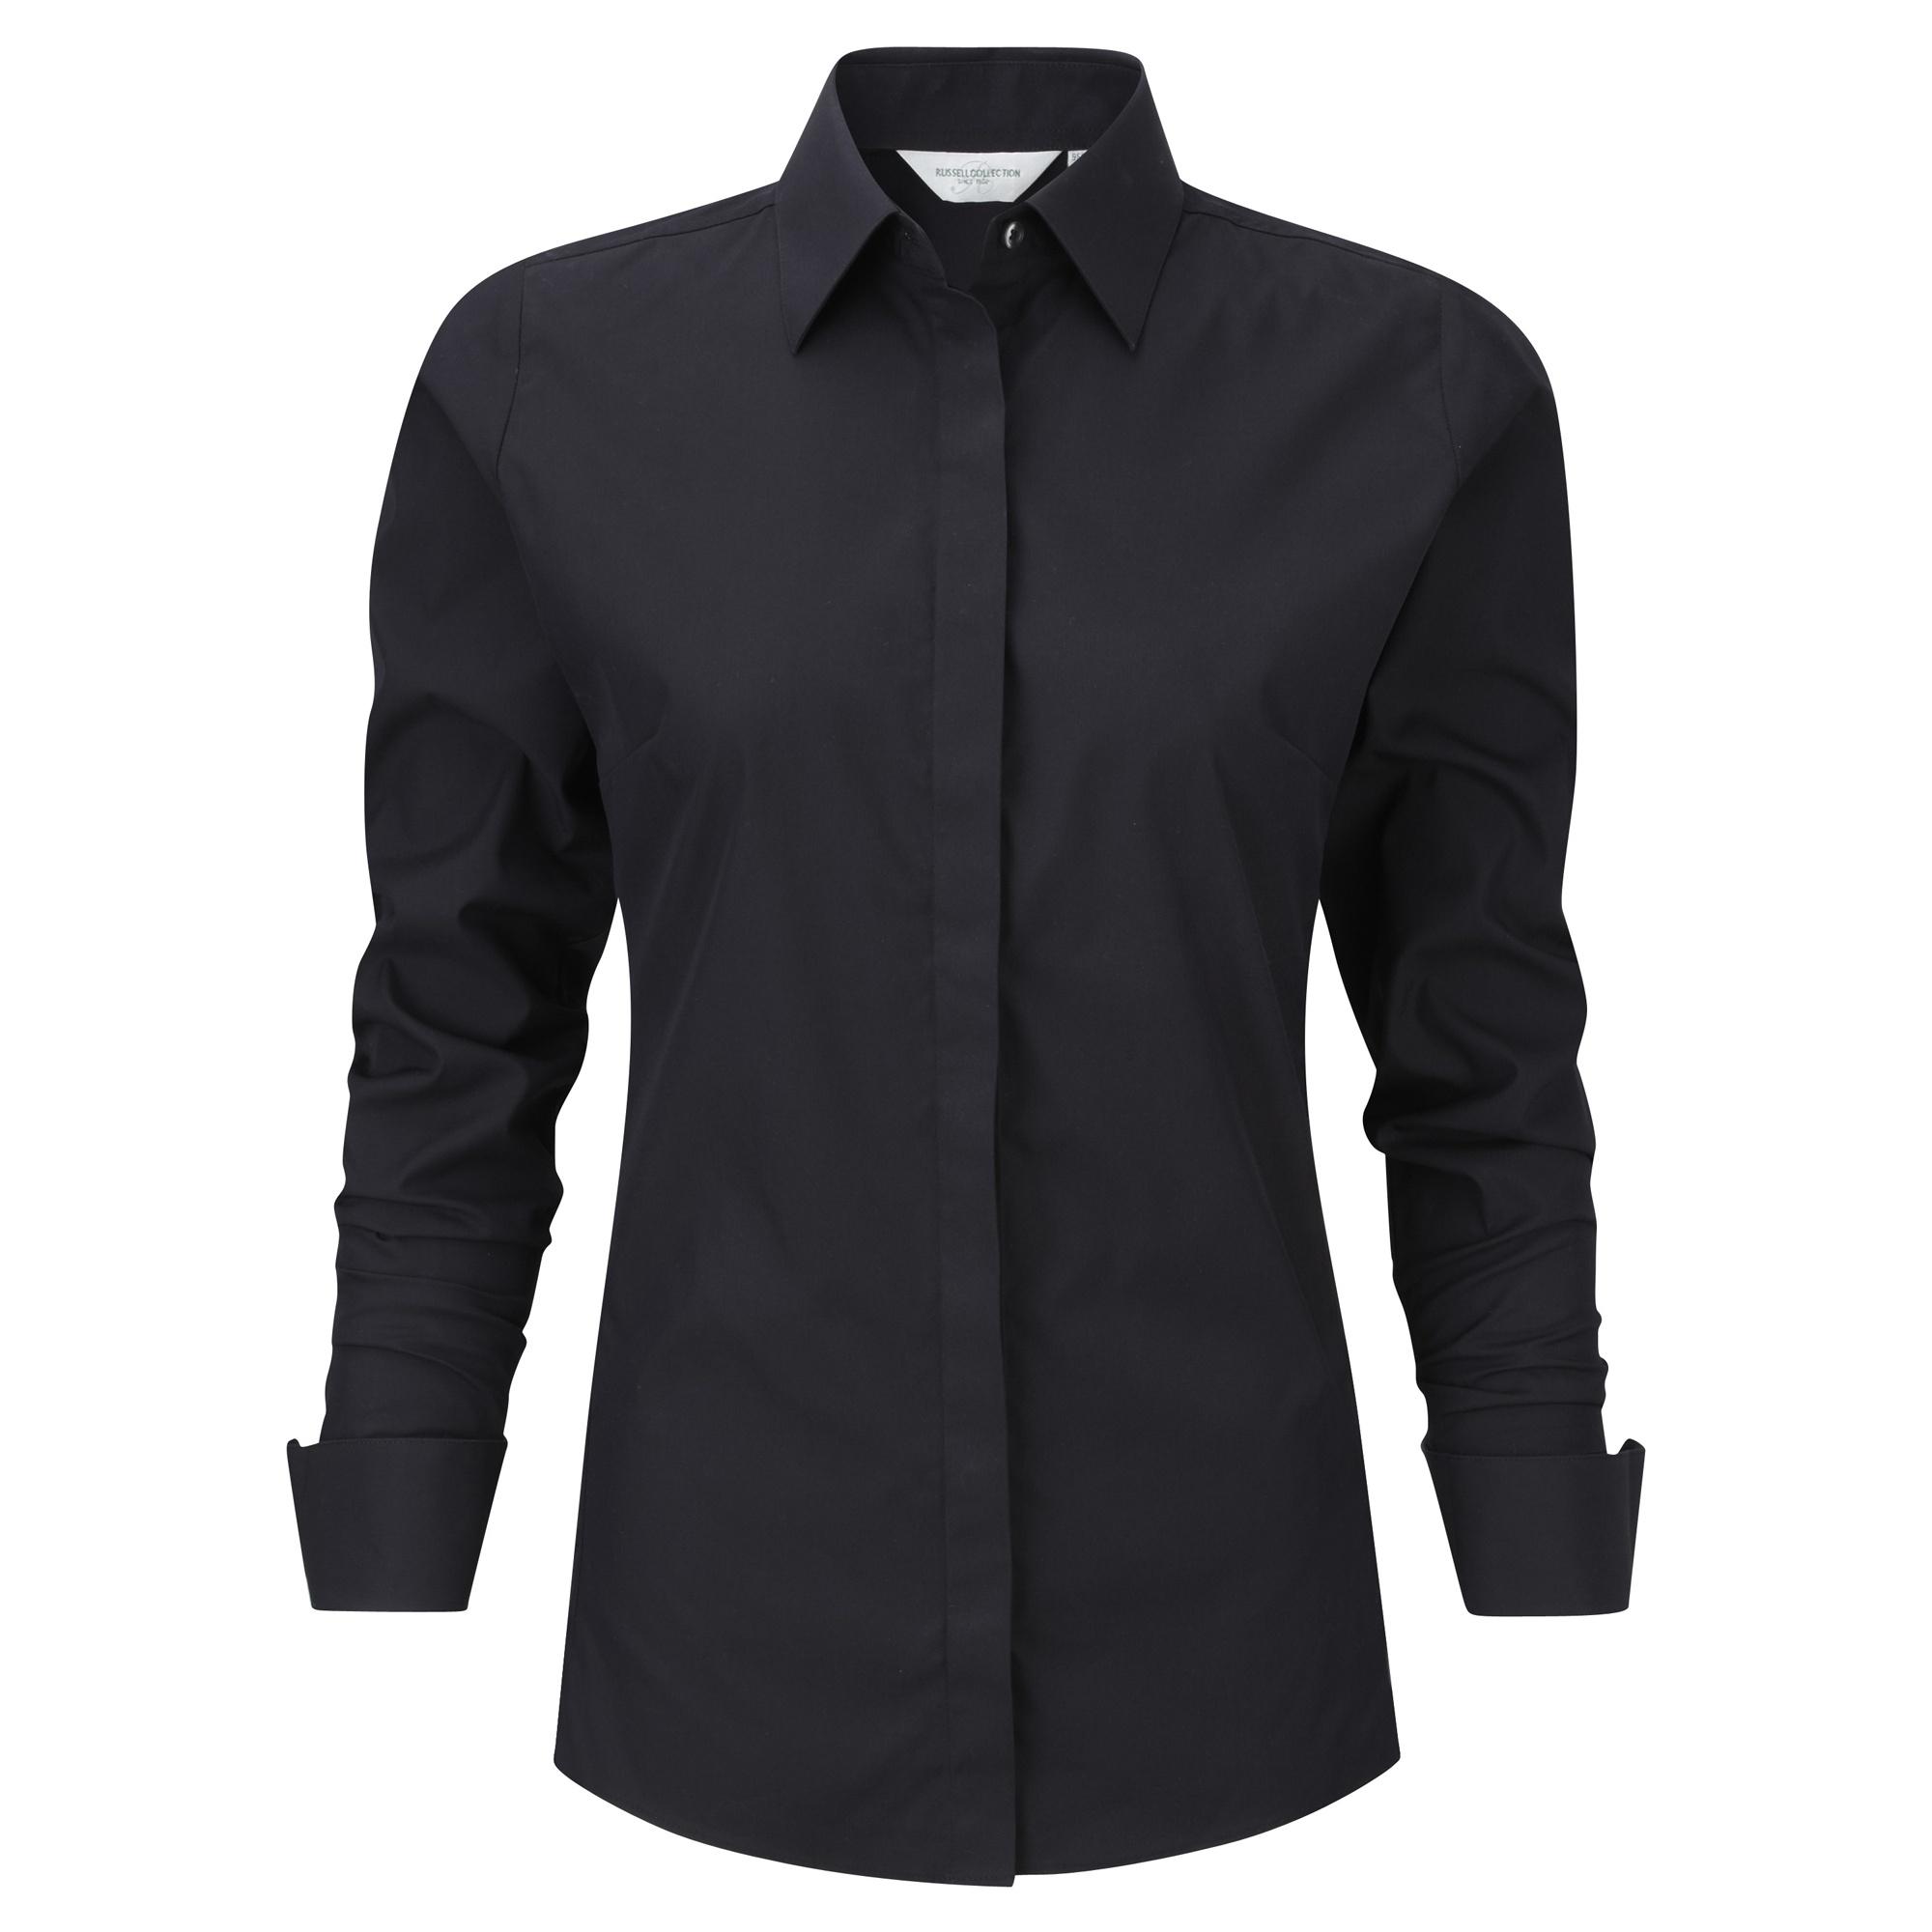 Russell Ladies/Womens Stretch Moisture Management Work Shirt (XL) (Black)